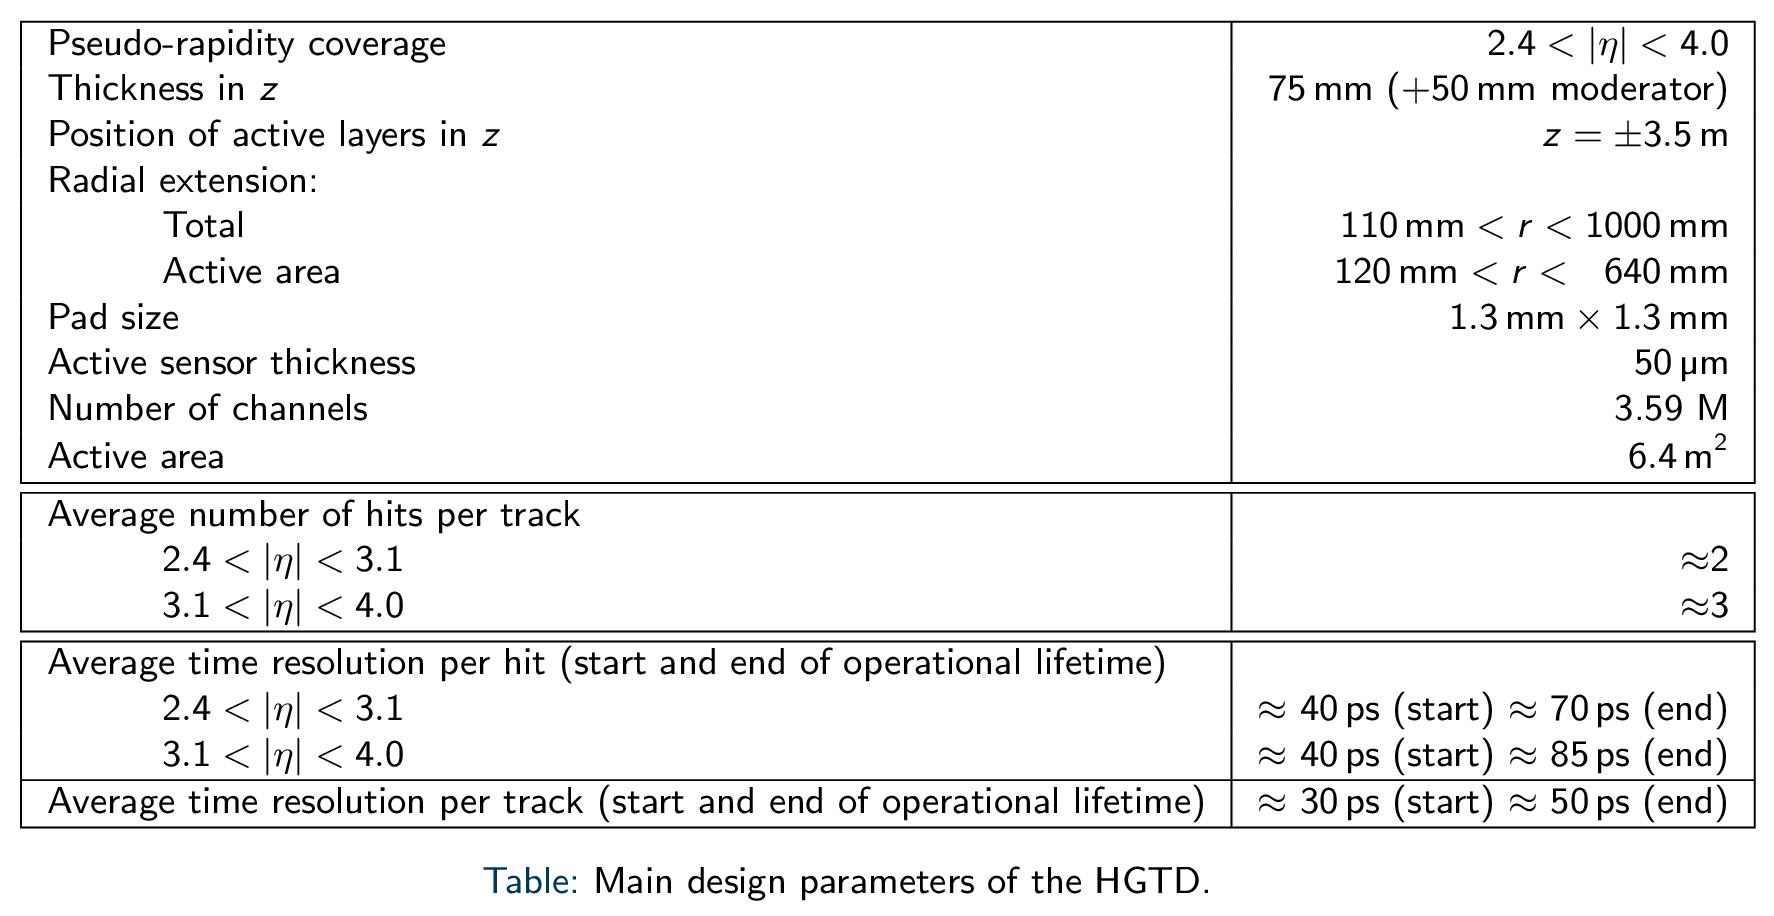 Sim_July2019_3_MainParameters